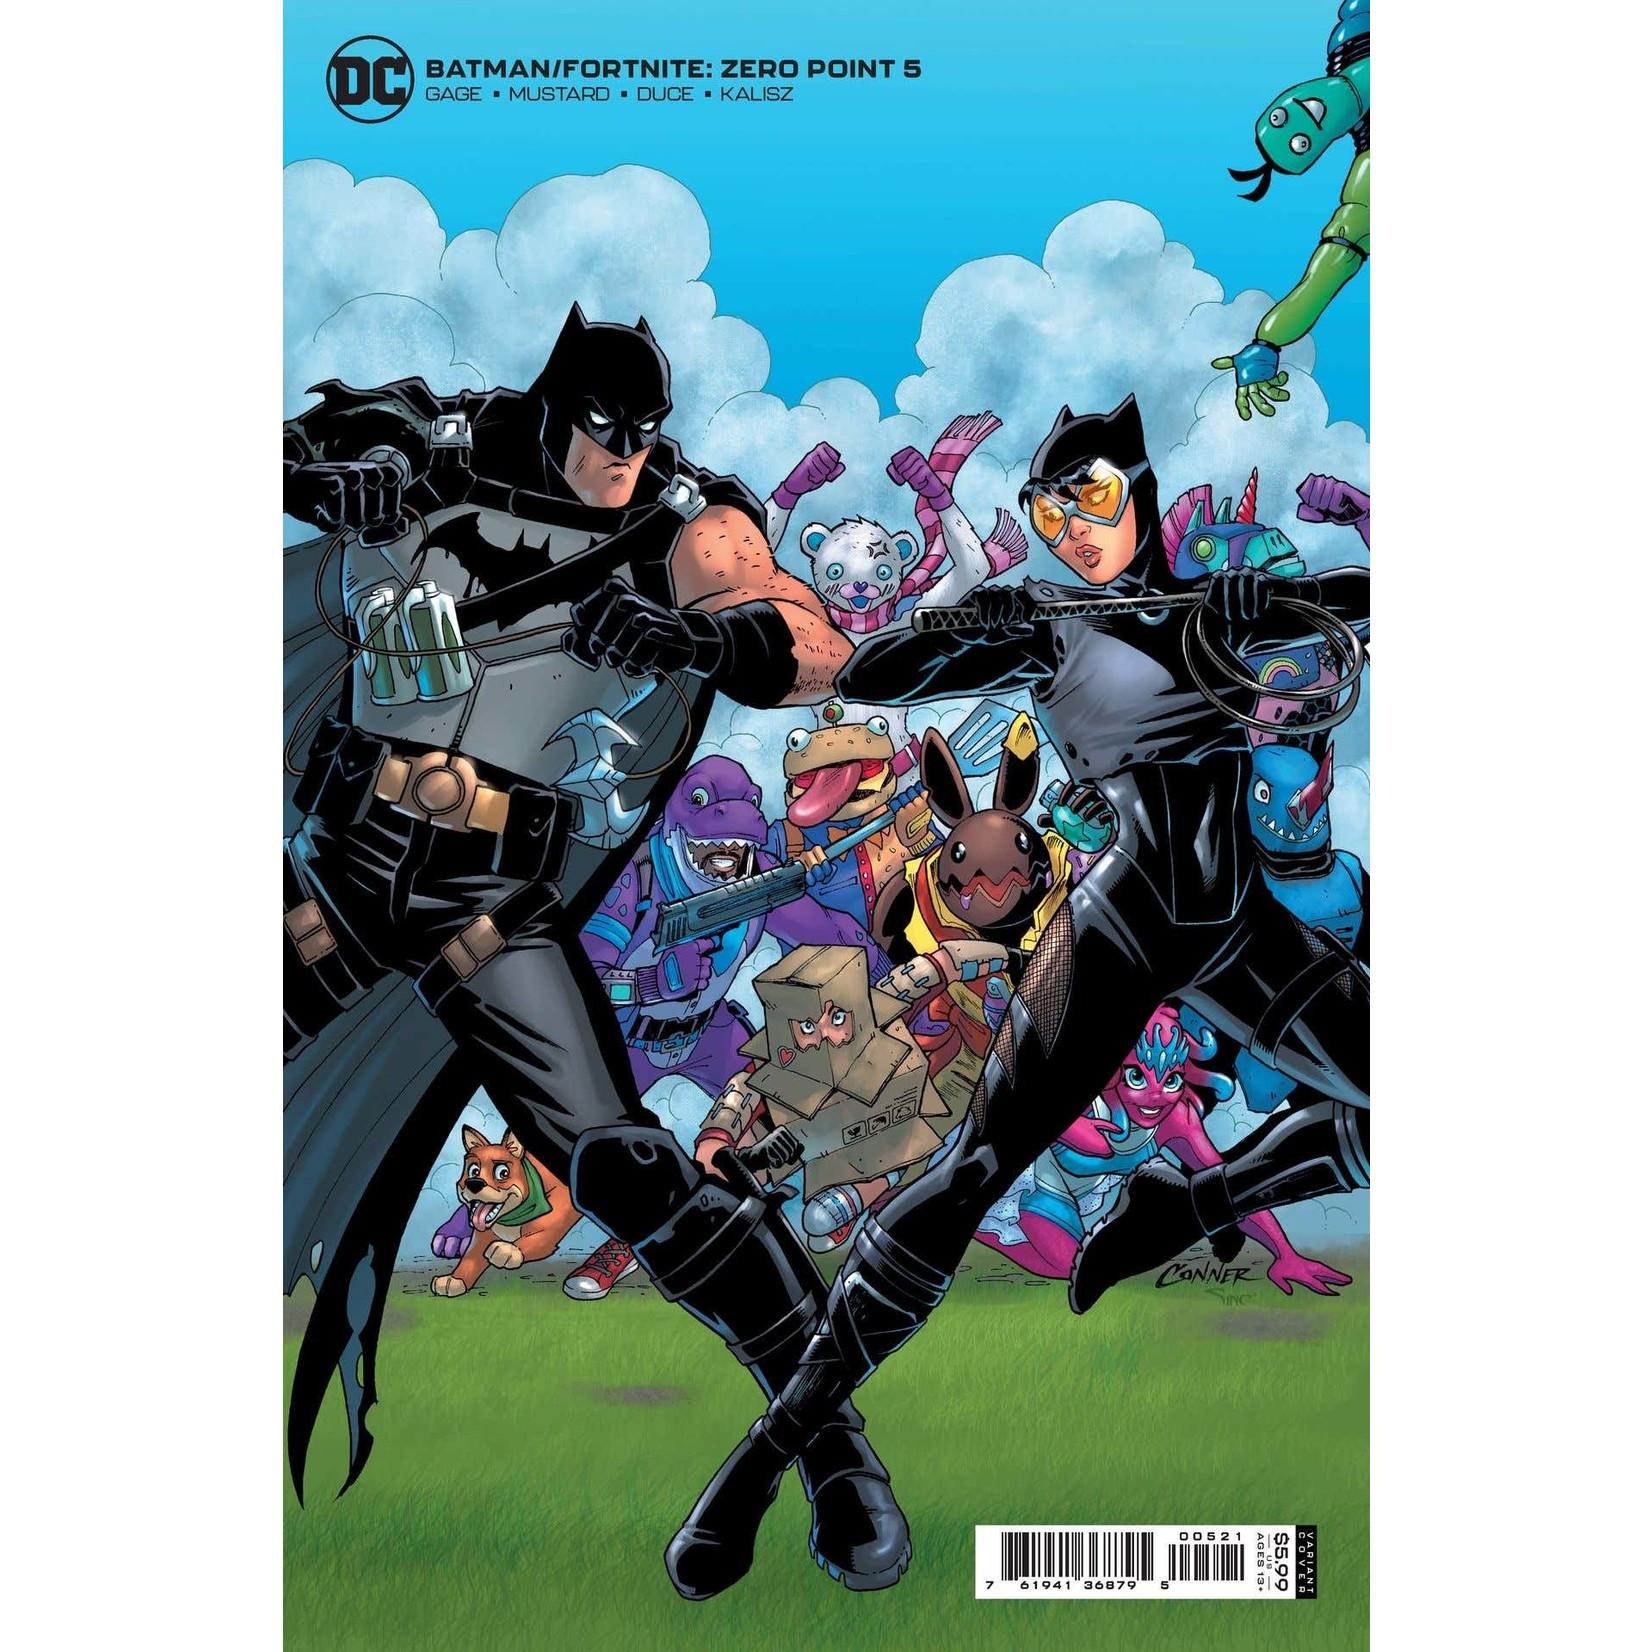 DC COMICS Batman Fortnite Zero Point #5 B